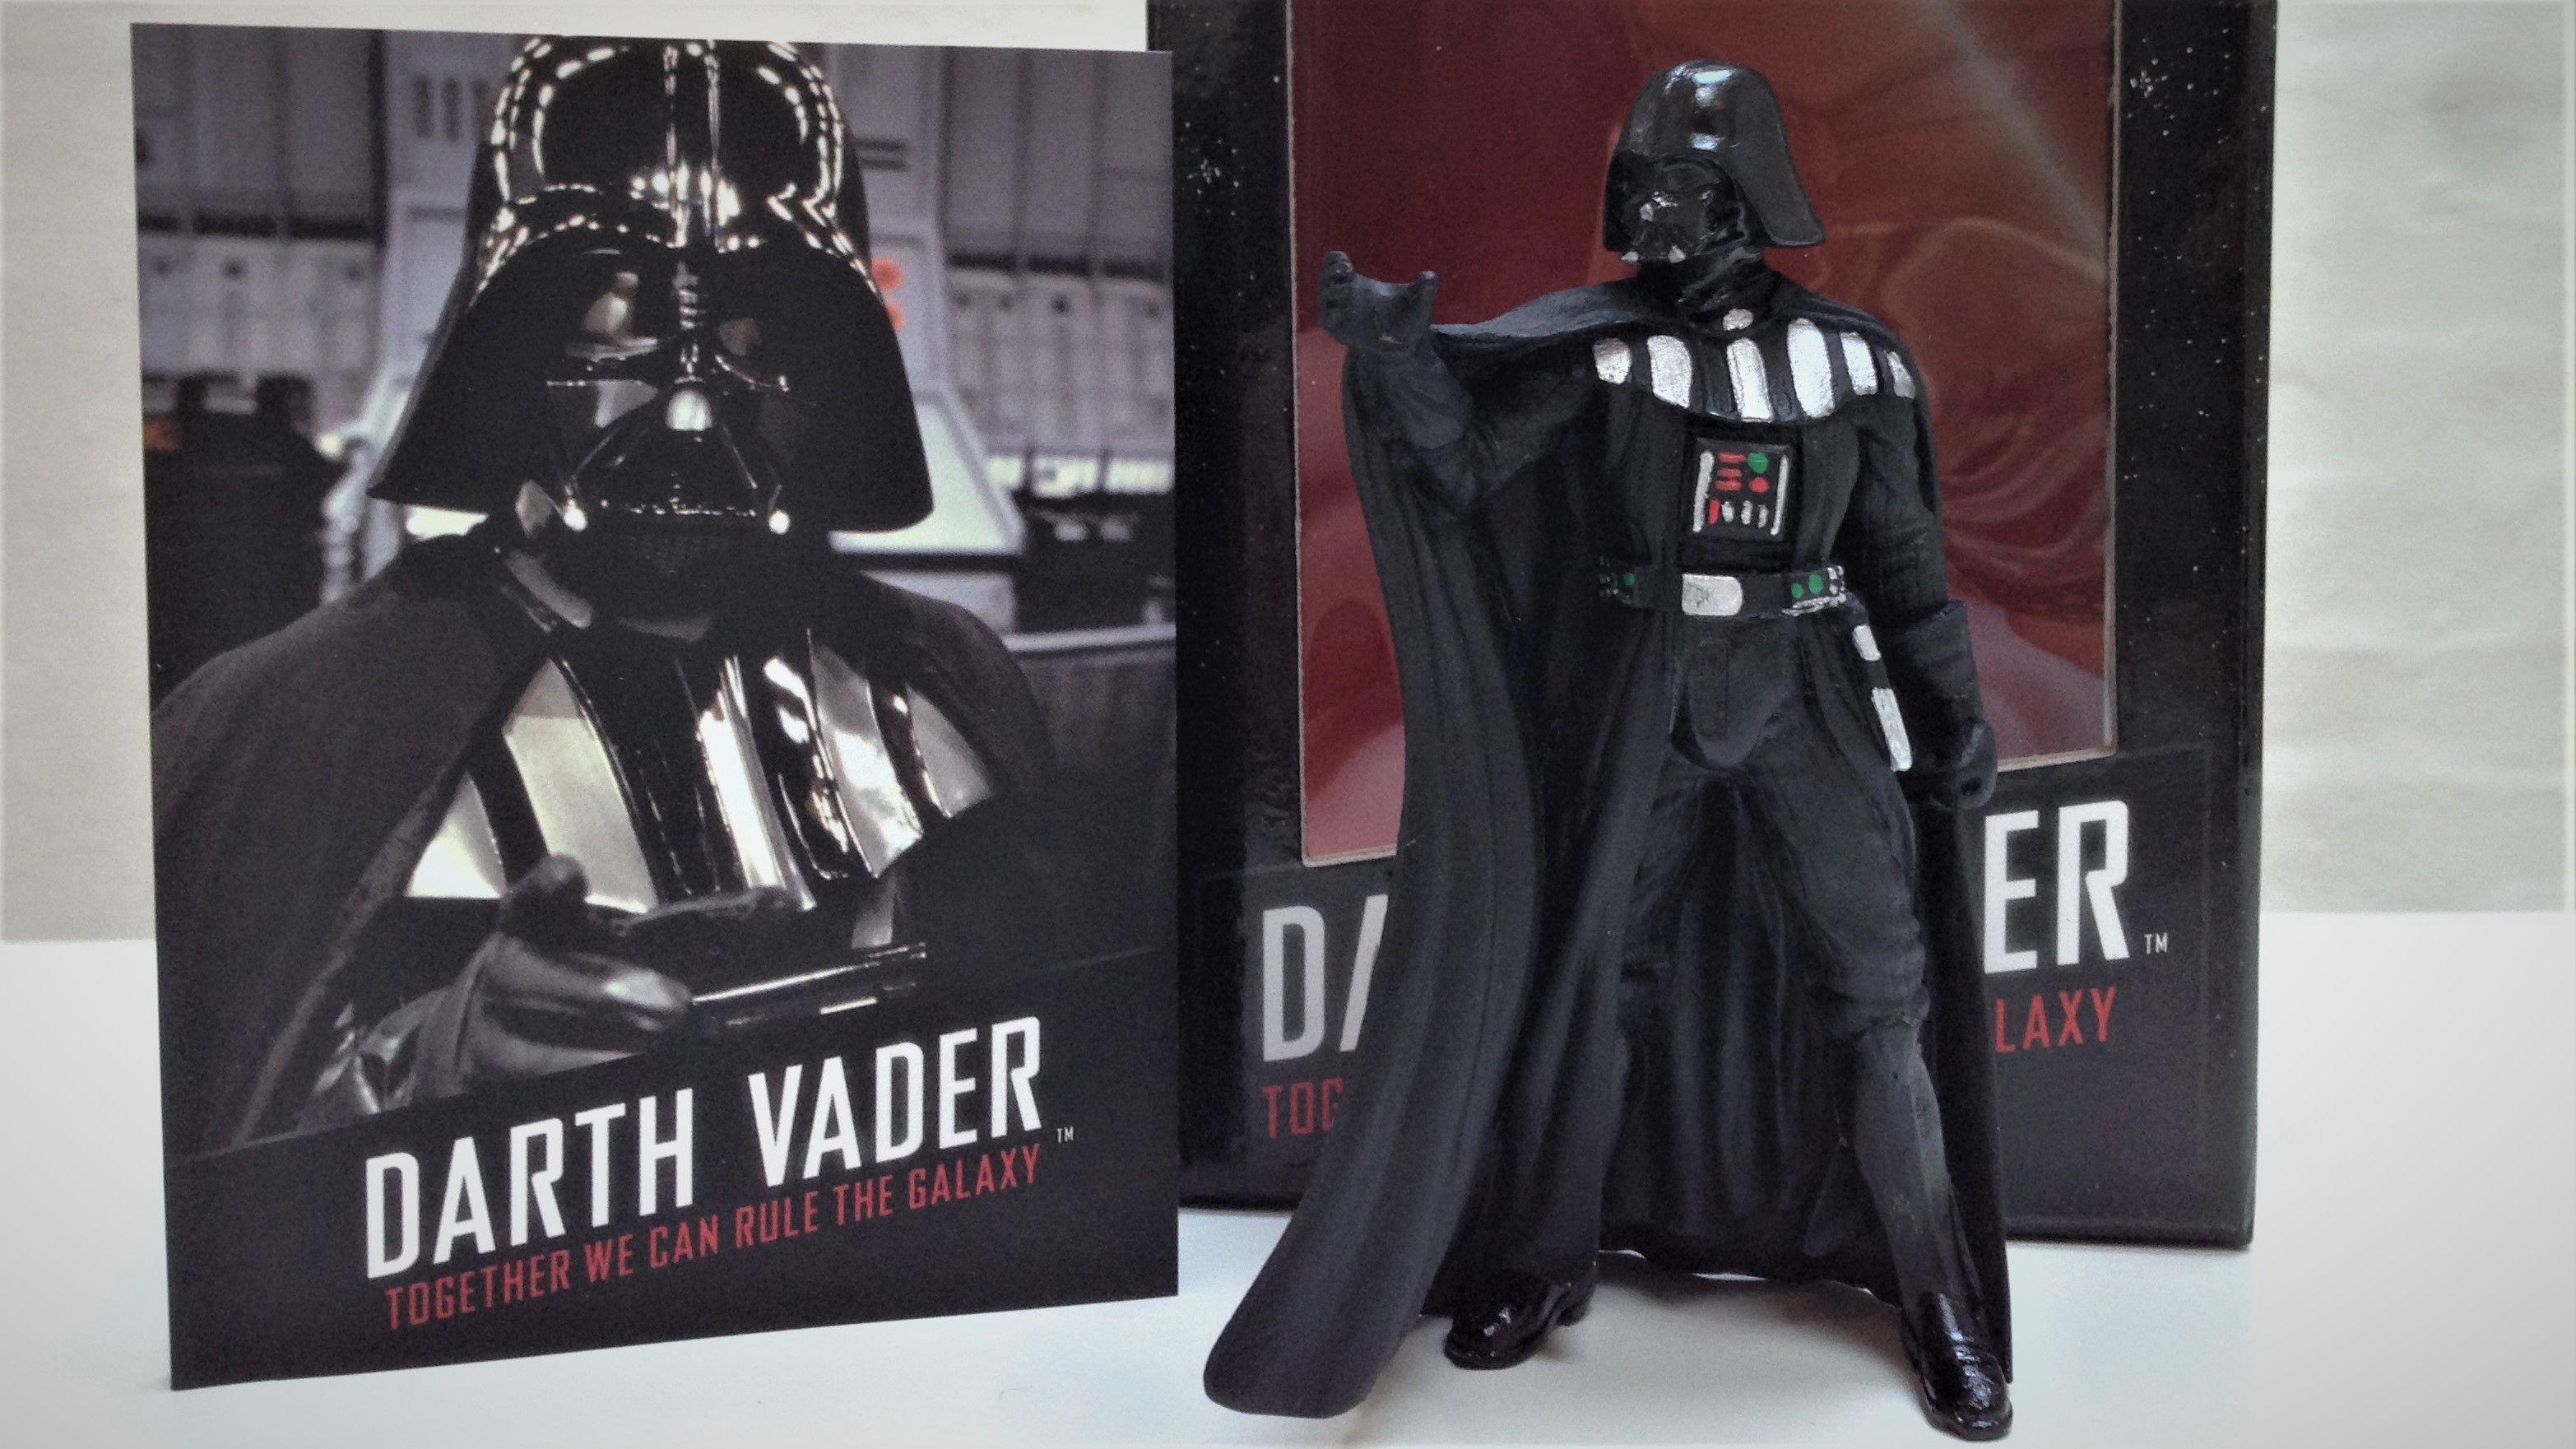 Star Wars - Darth Vader in a Box - Chronicle Books - Plusbog.dk - Fiktion & Kultur - Star Wars-figur - Darth Vader - Dart Vader quotes citater (7)